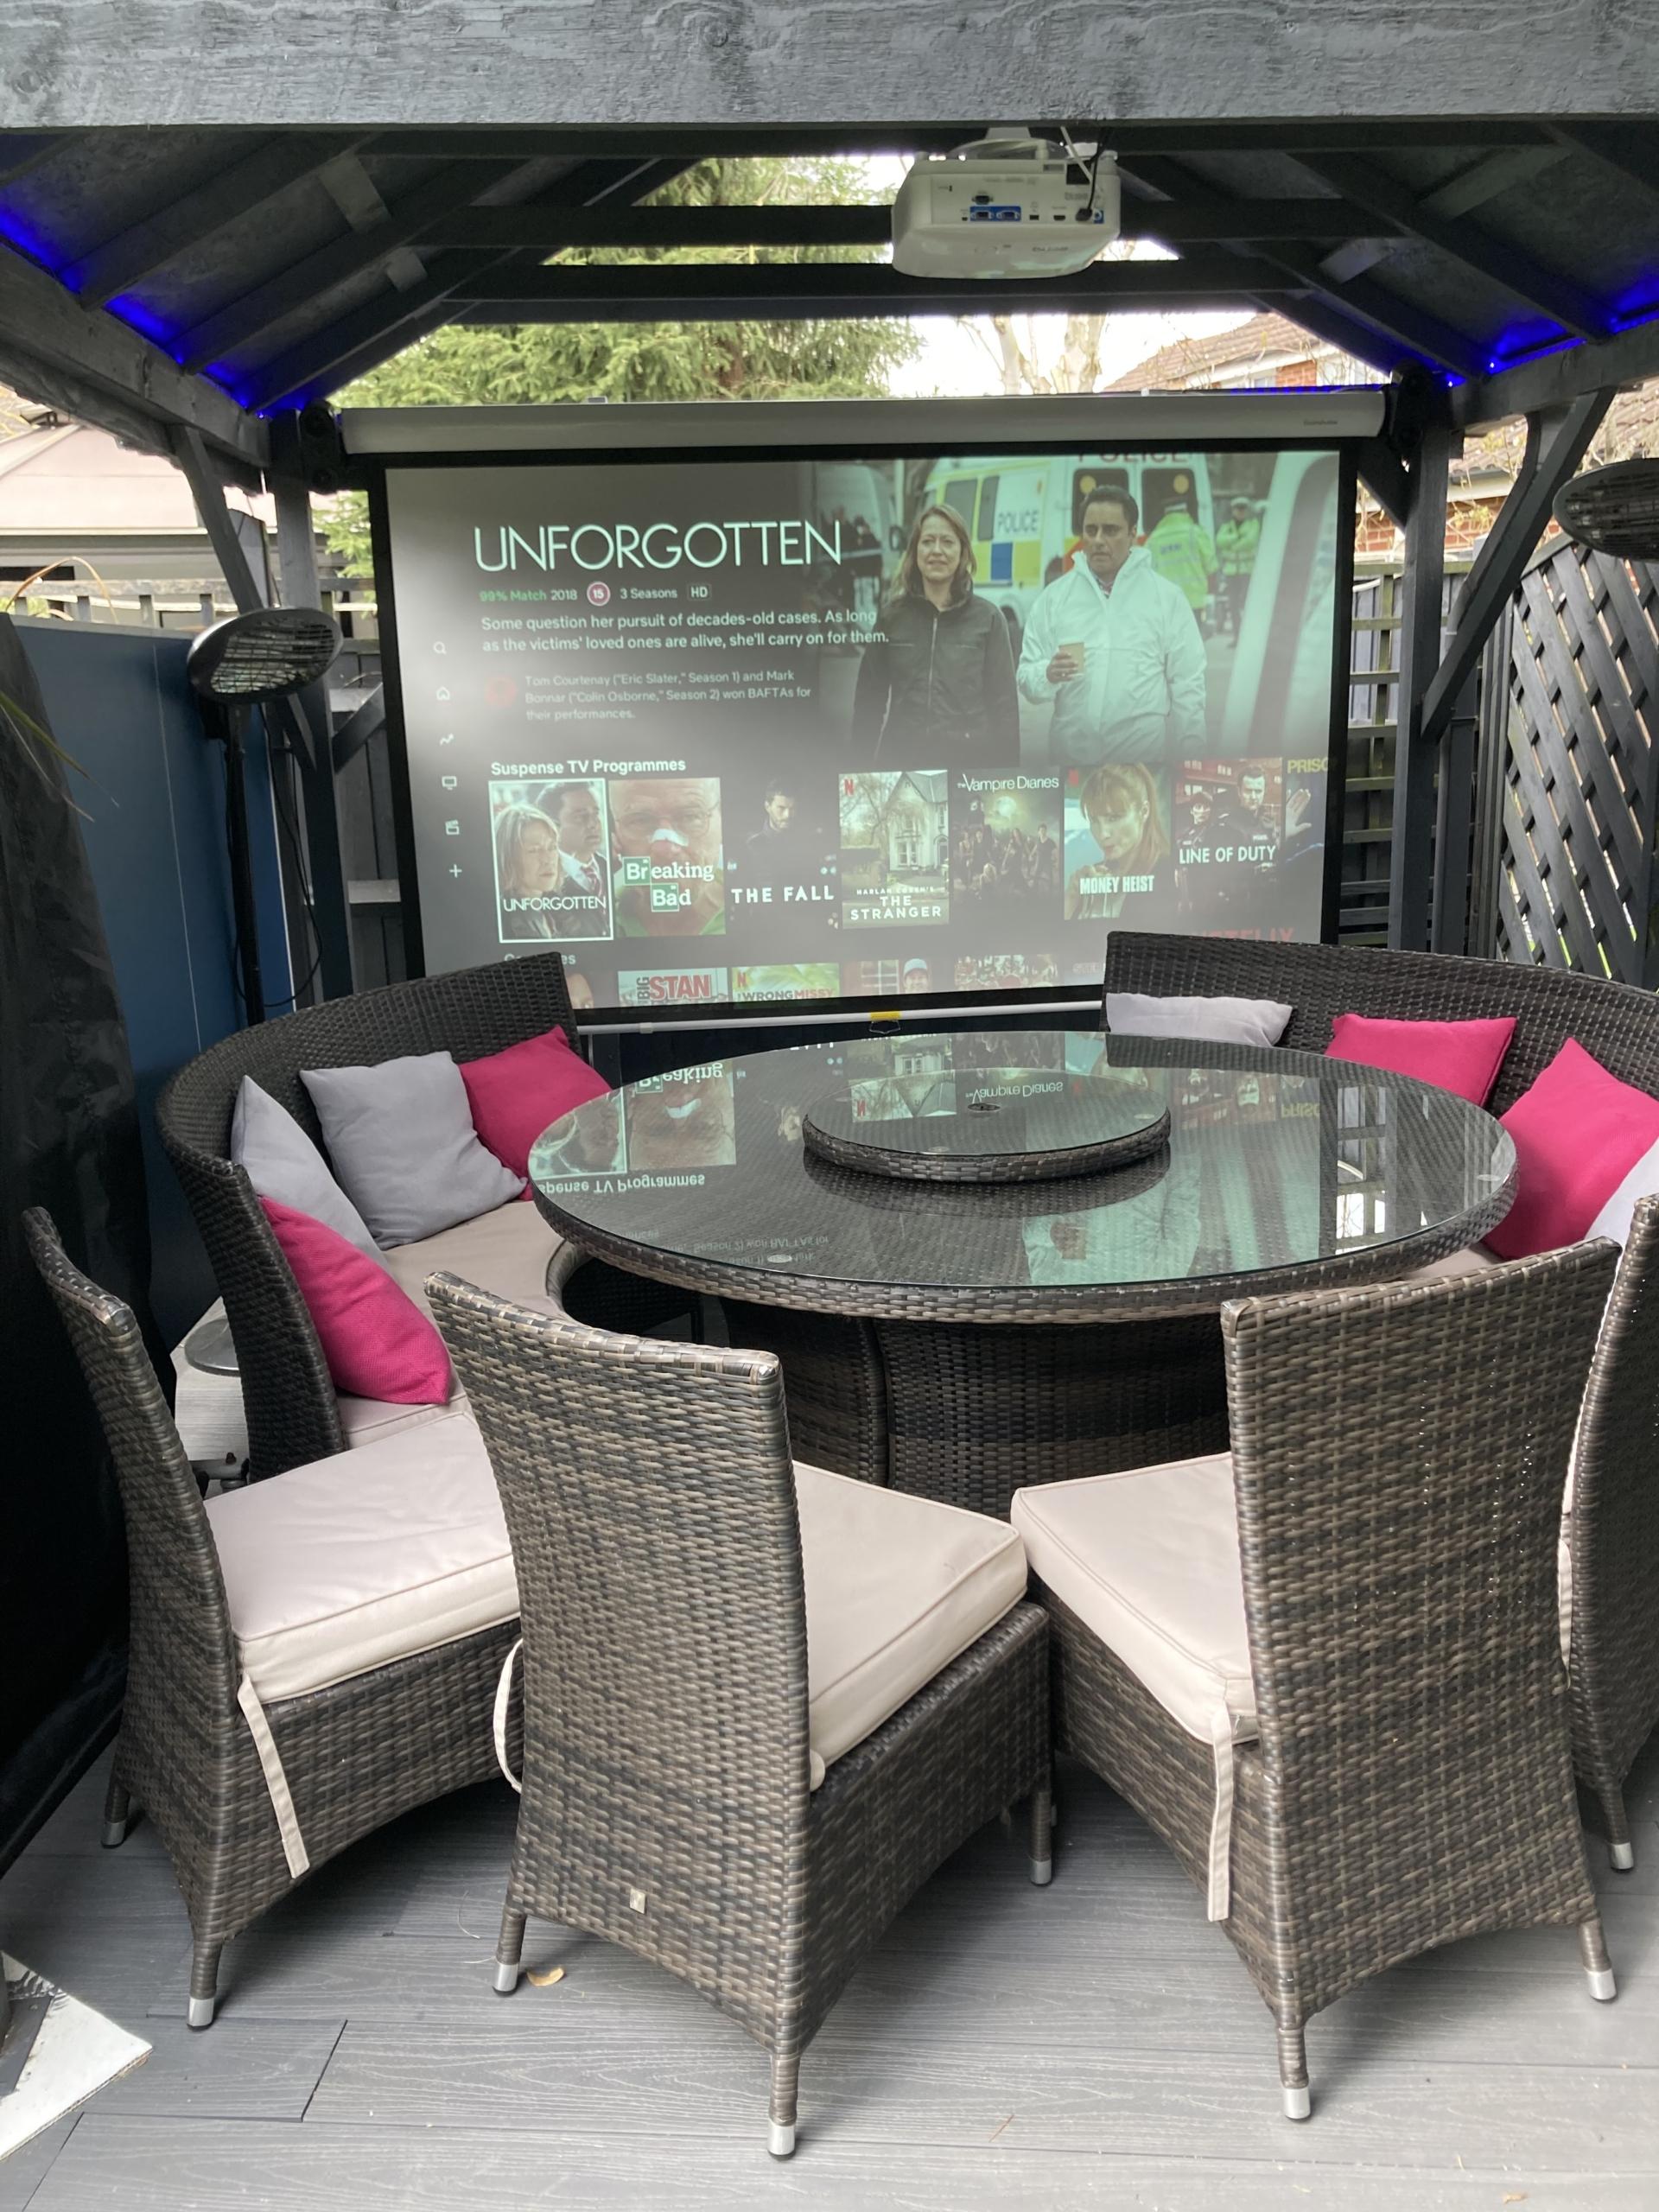 outdoor cinema screen in daylight